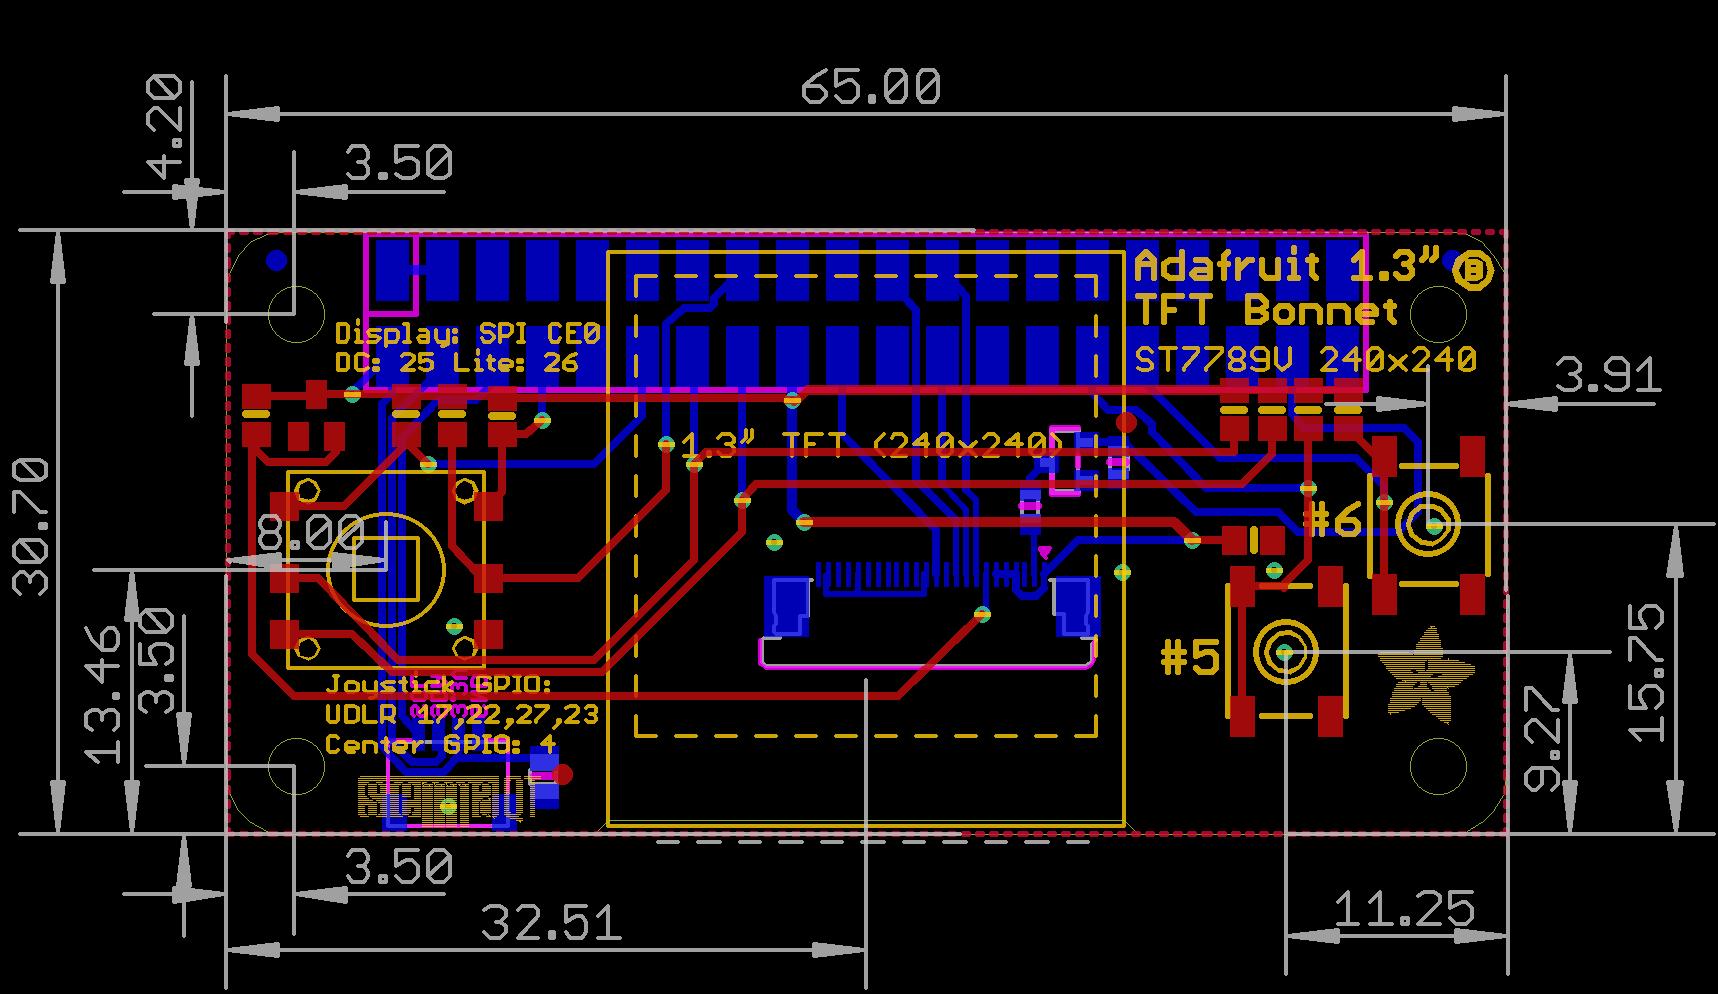 adafruit_products_Adafruit_1-3in_Color_TFT_Bonnet_fab_print.png